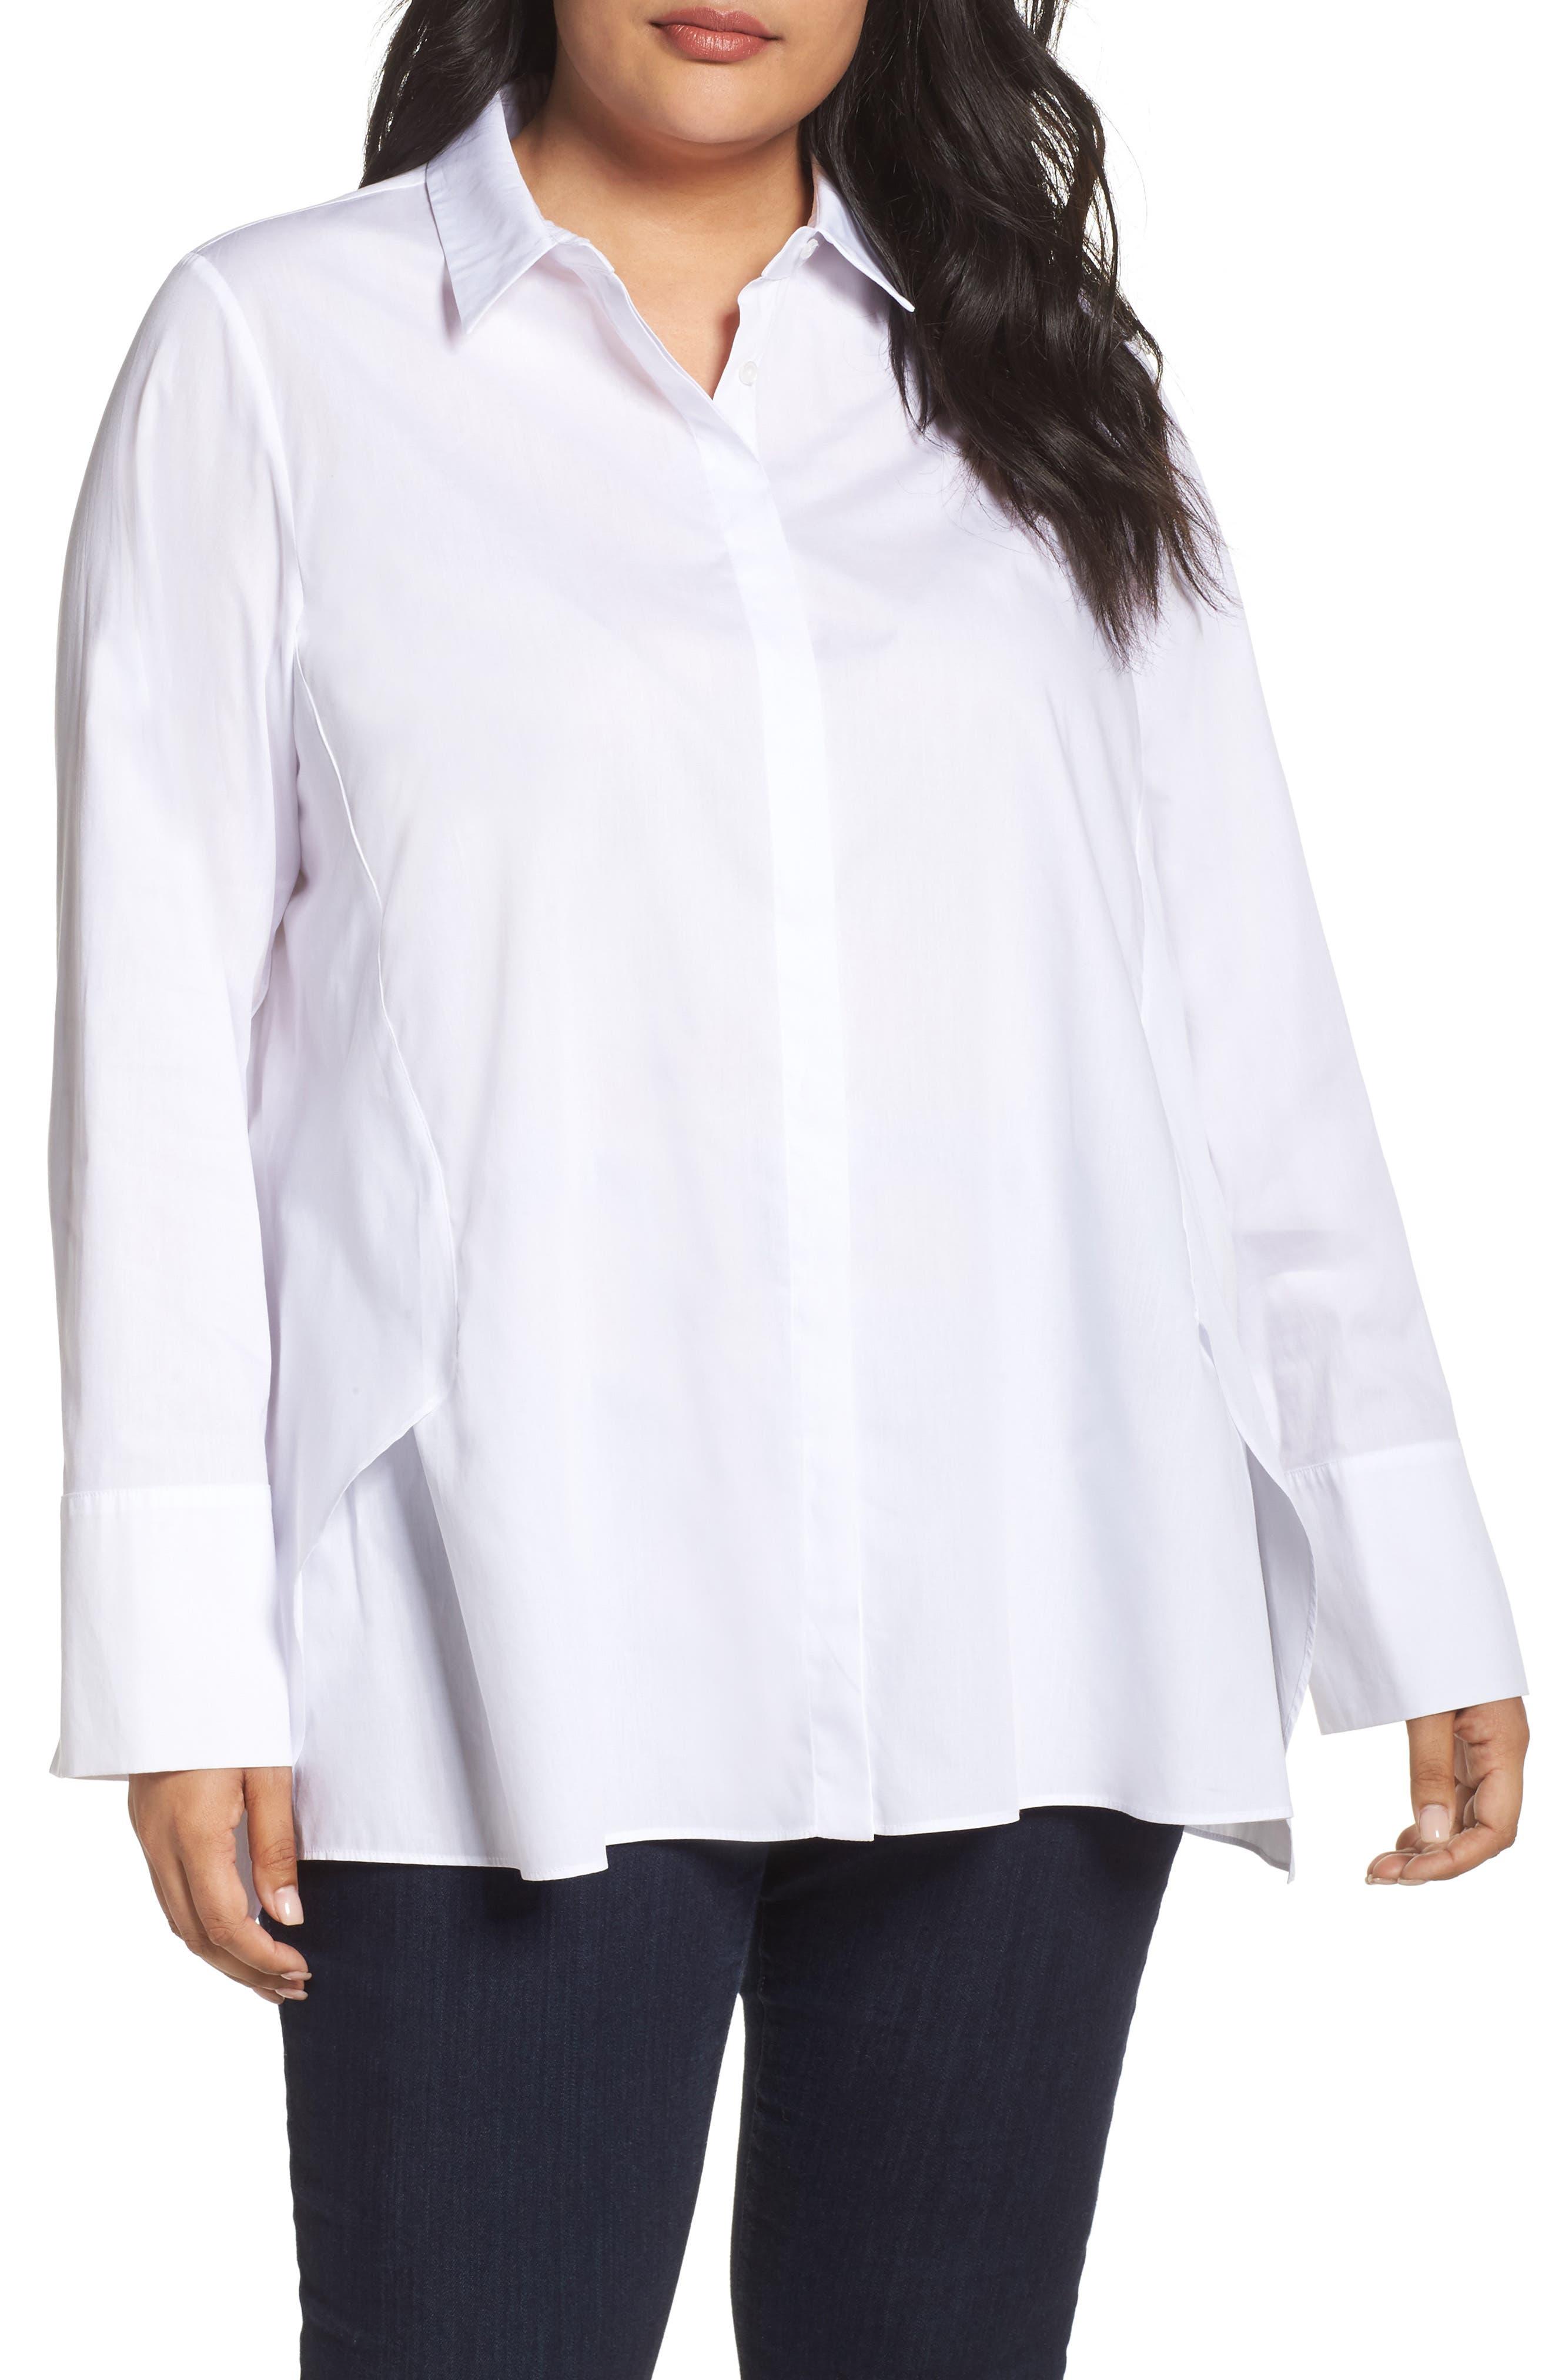 Fato Shirt,                         Main,                         color,